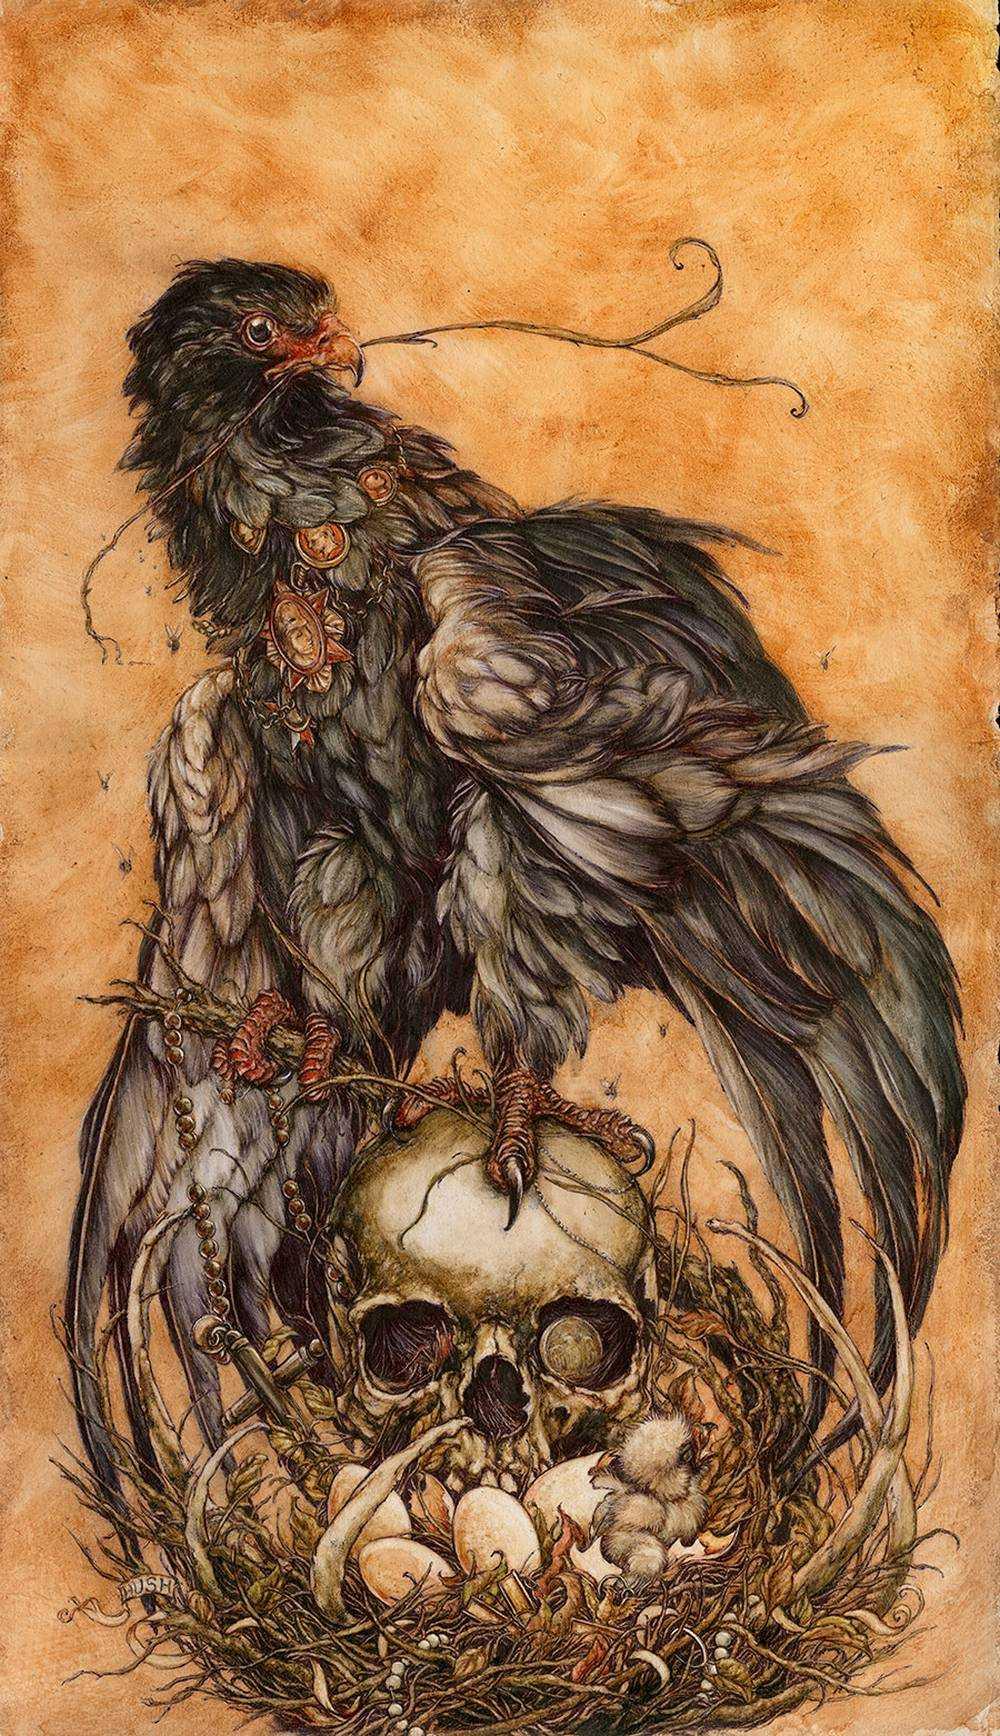 Jeremy hush - Illustrations 2568